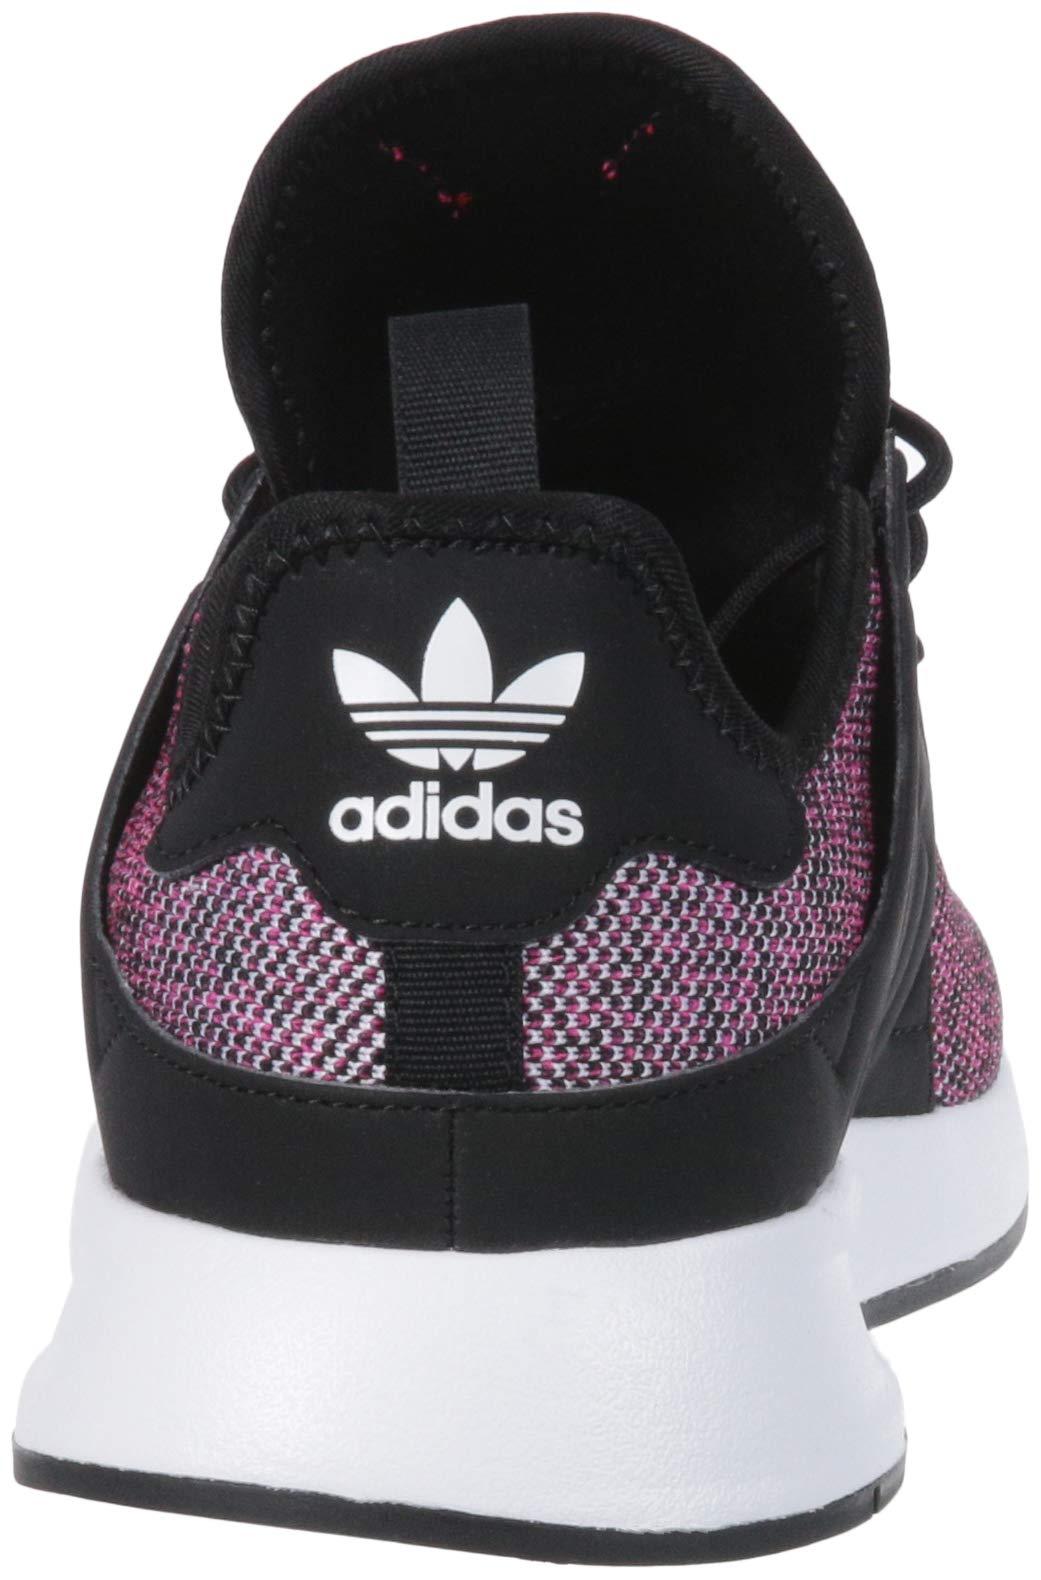 adidas Originals Unisex X_PLR Running Shoe, Shock Pink/Black/White, 3.5 M US Big Kid by adidas Originals (Image #2)